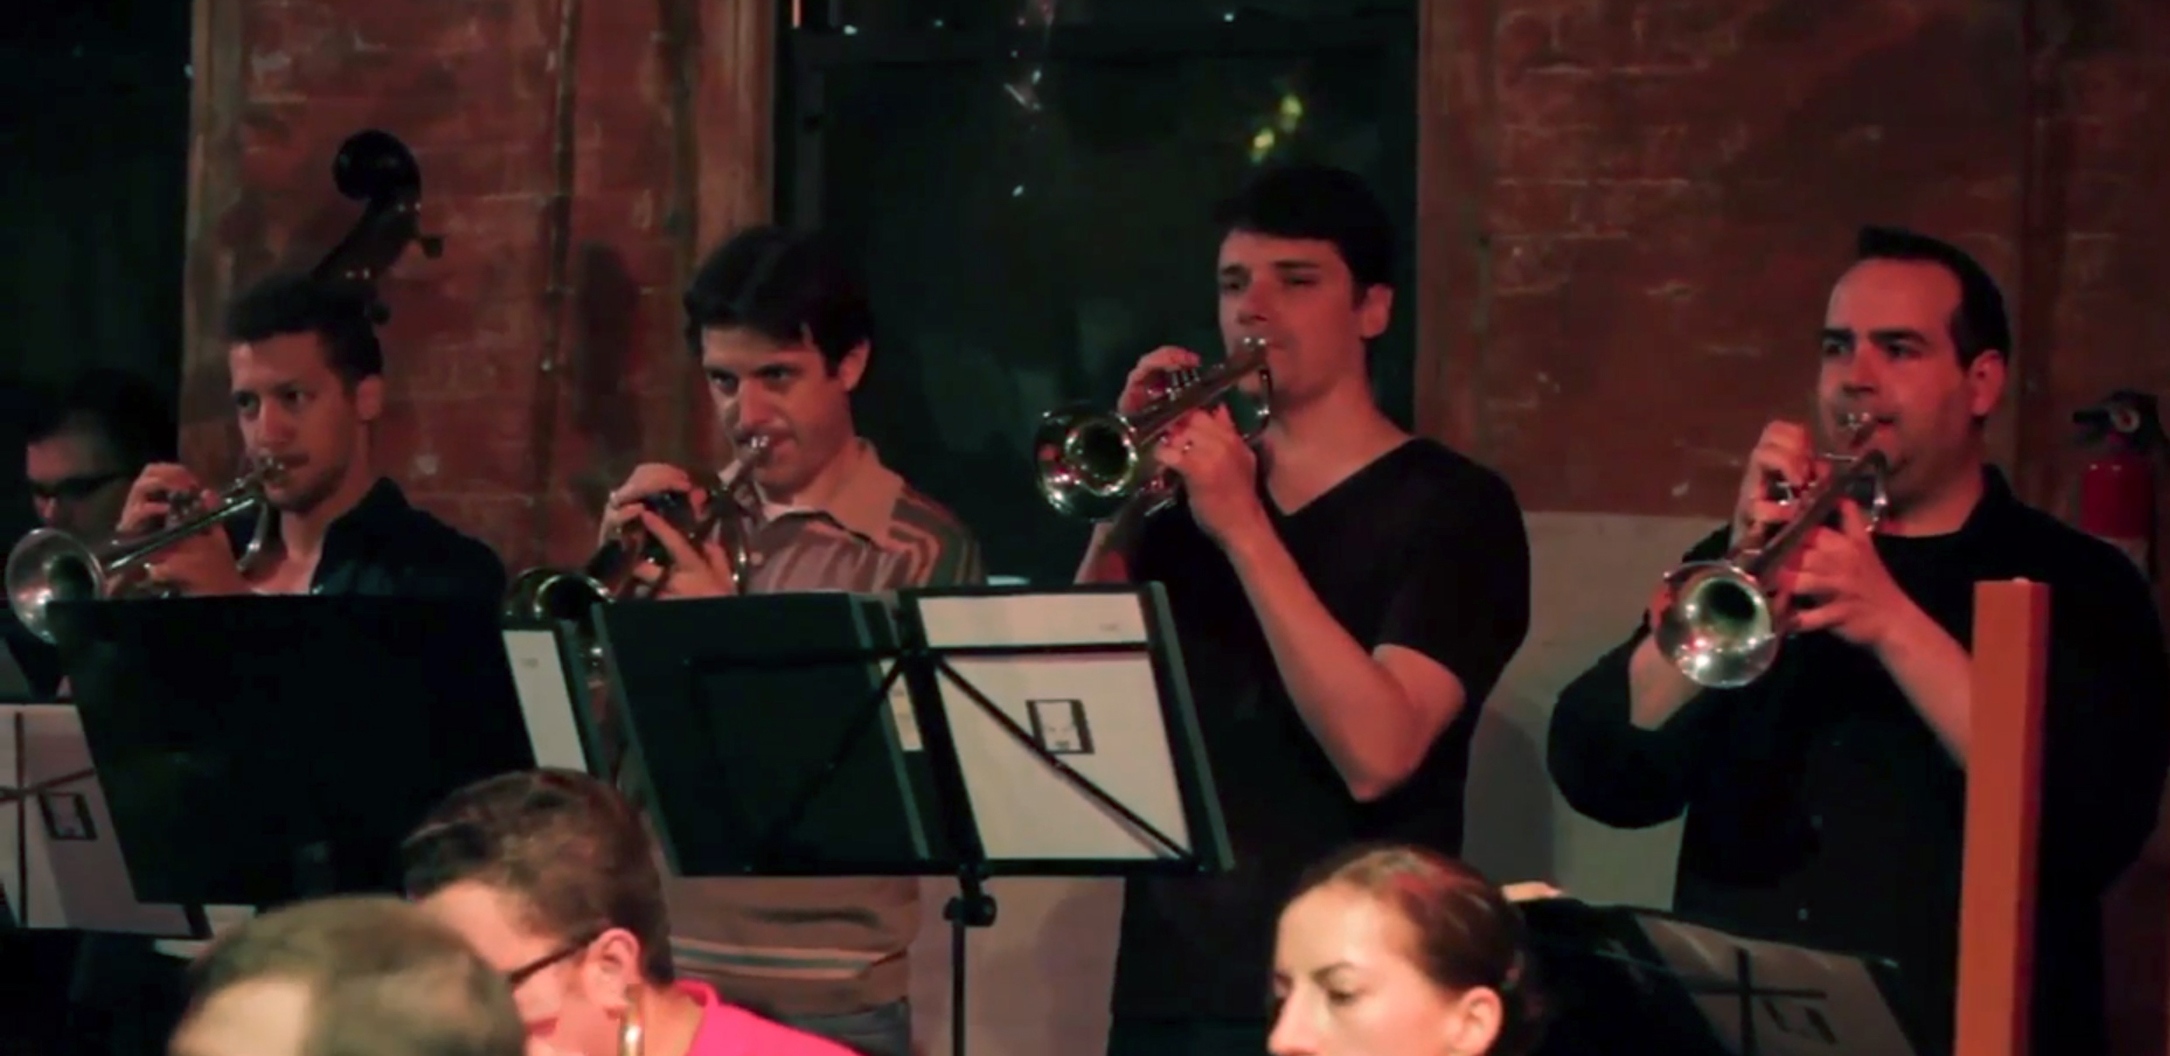 The Awakening Orchestra at the Tea Lounge, Brooklyn NY, 2013